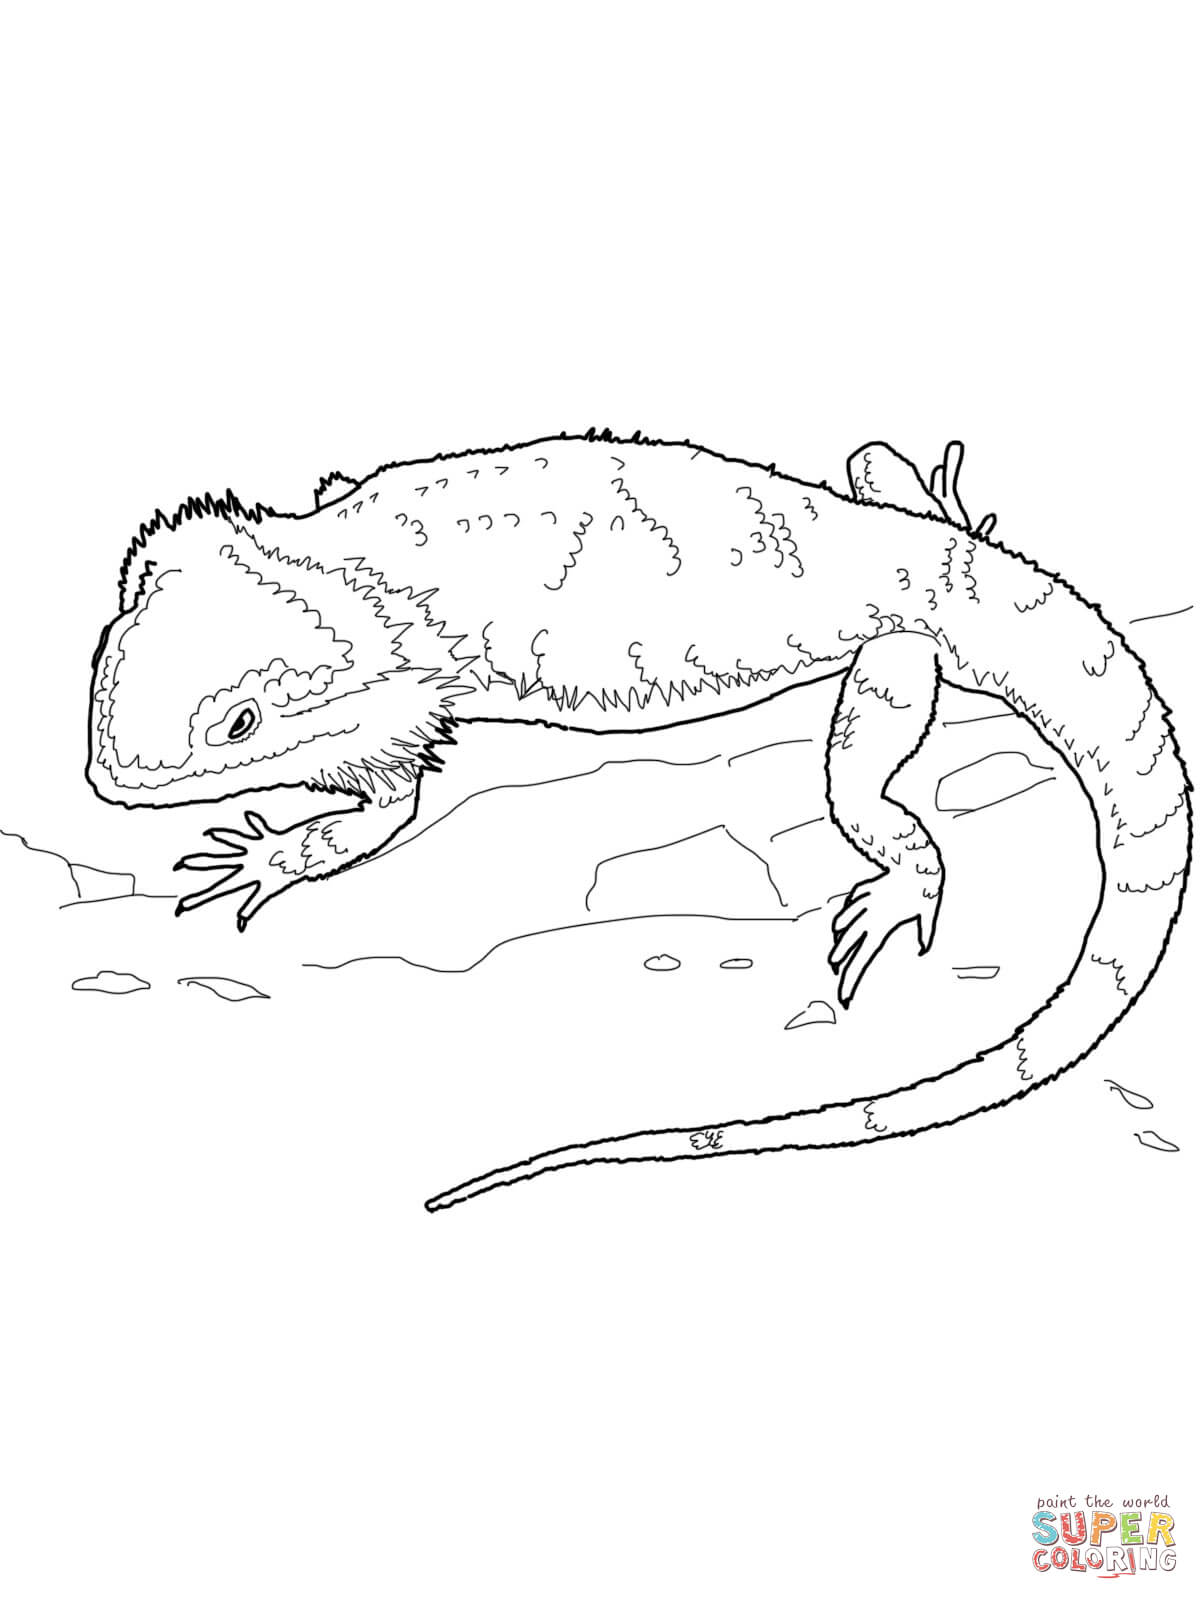 Australian Water Dragon coloring page.